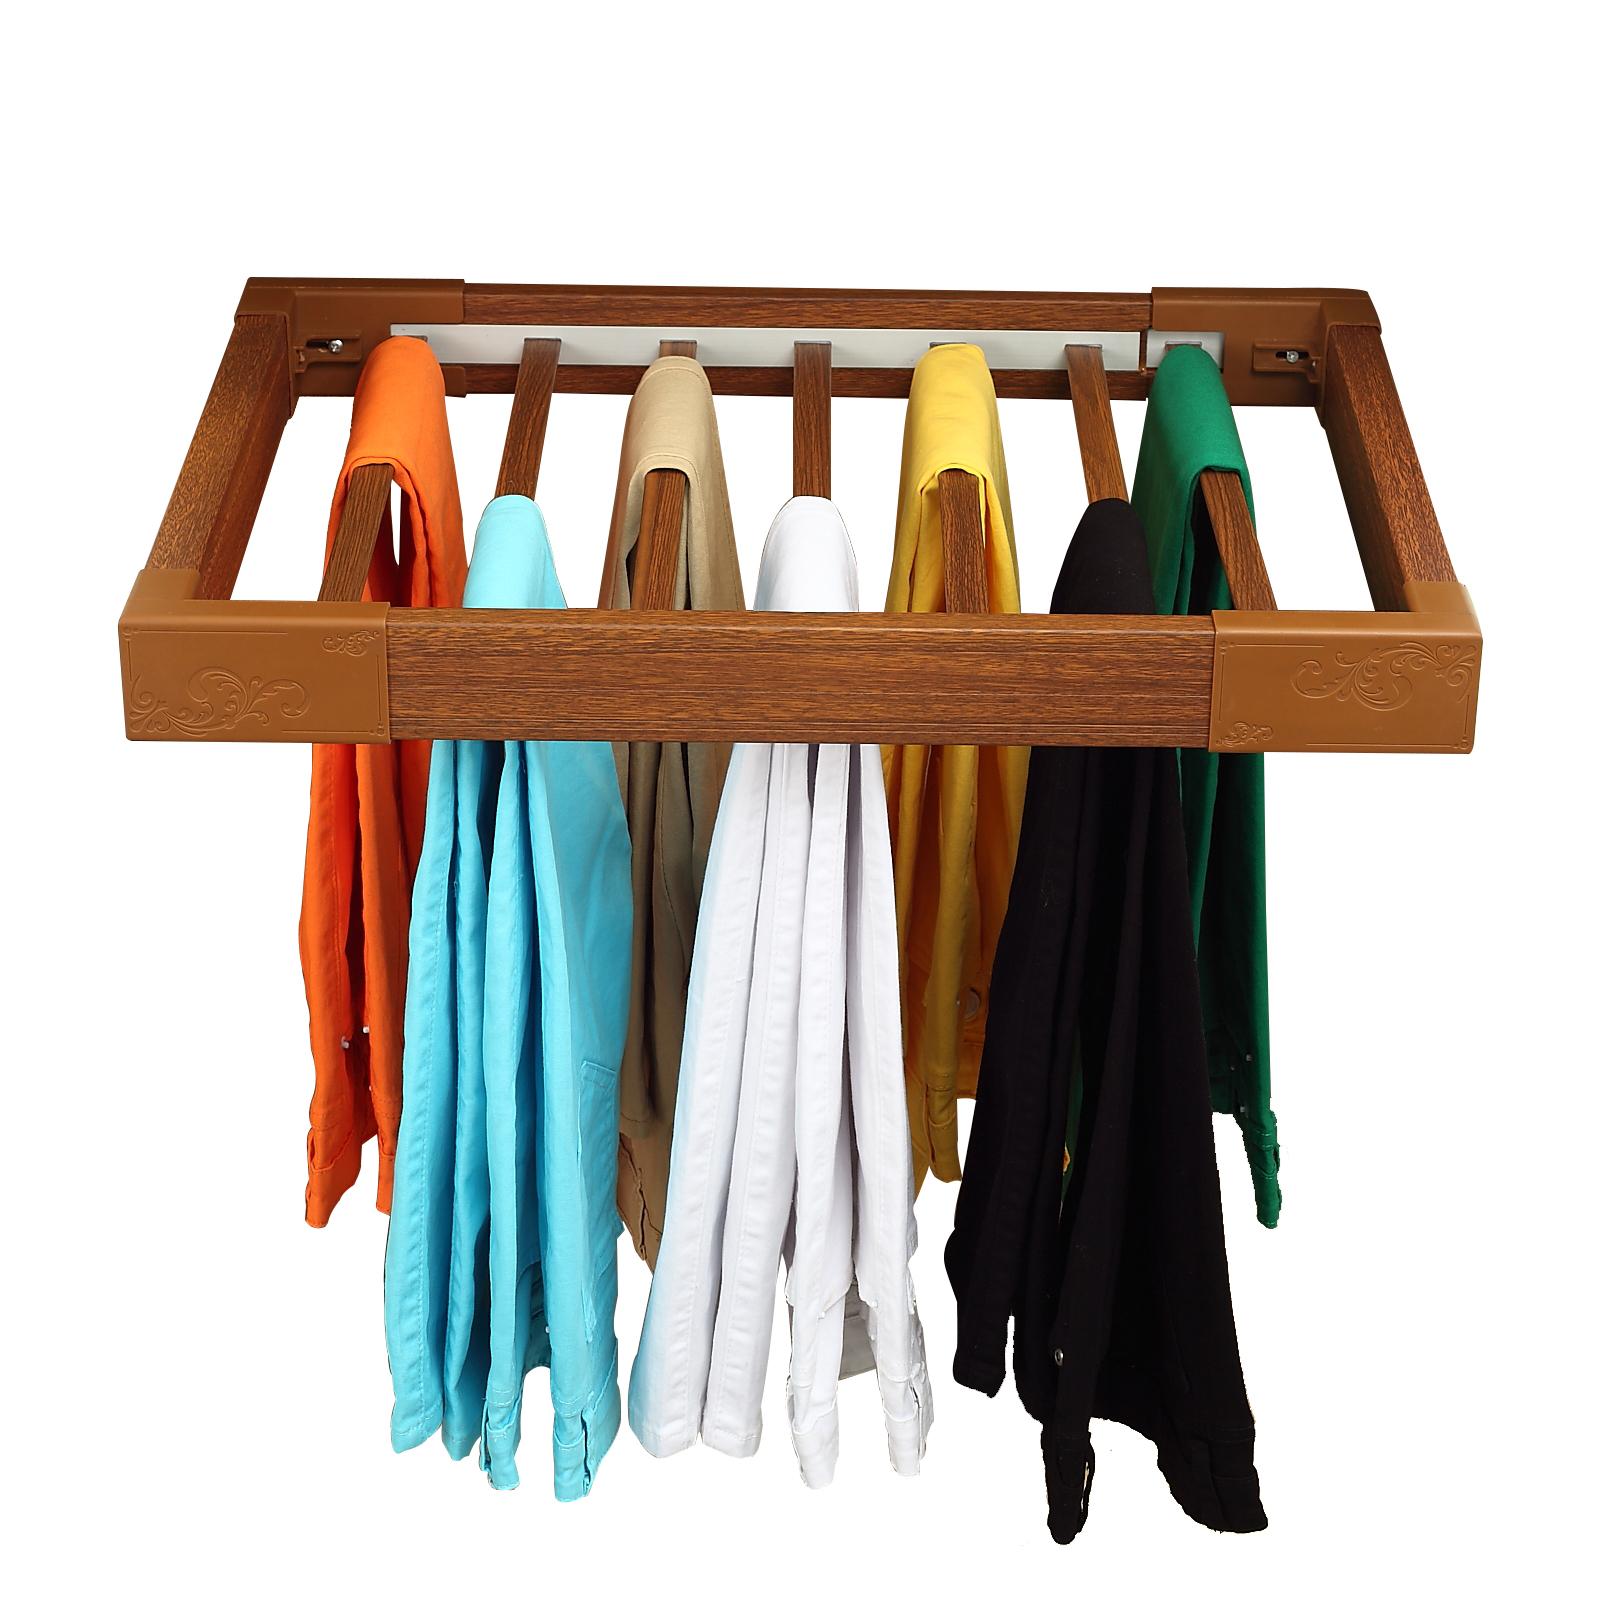 hanger images textile pants casual fashion apparel shirts clothing furniture room hanging wardrobe interior photo closet en clothes rack garment design free